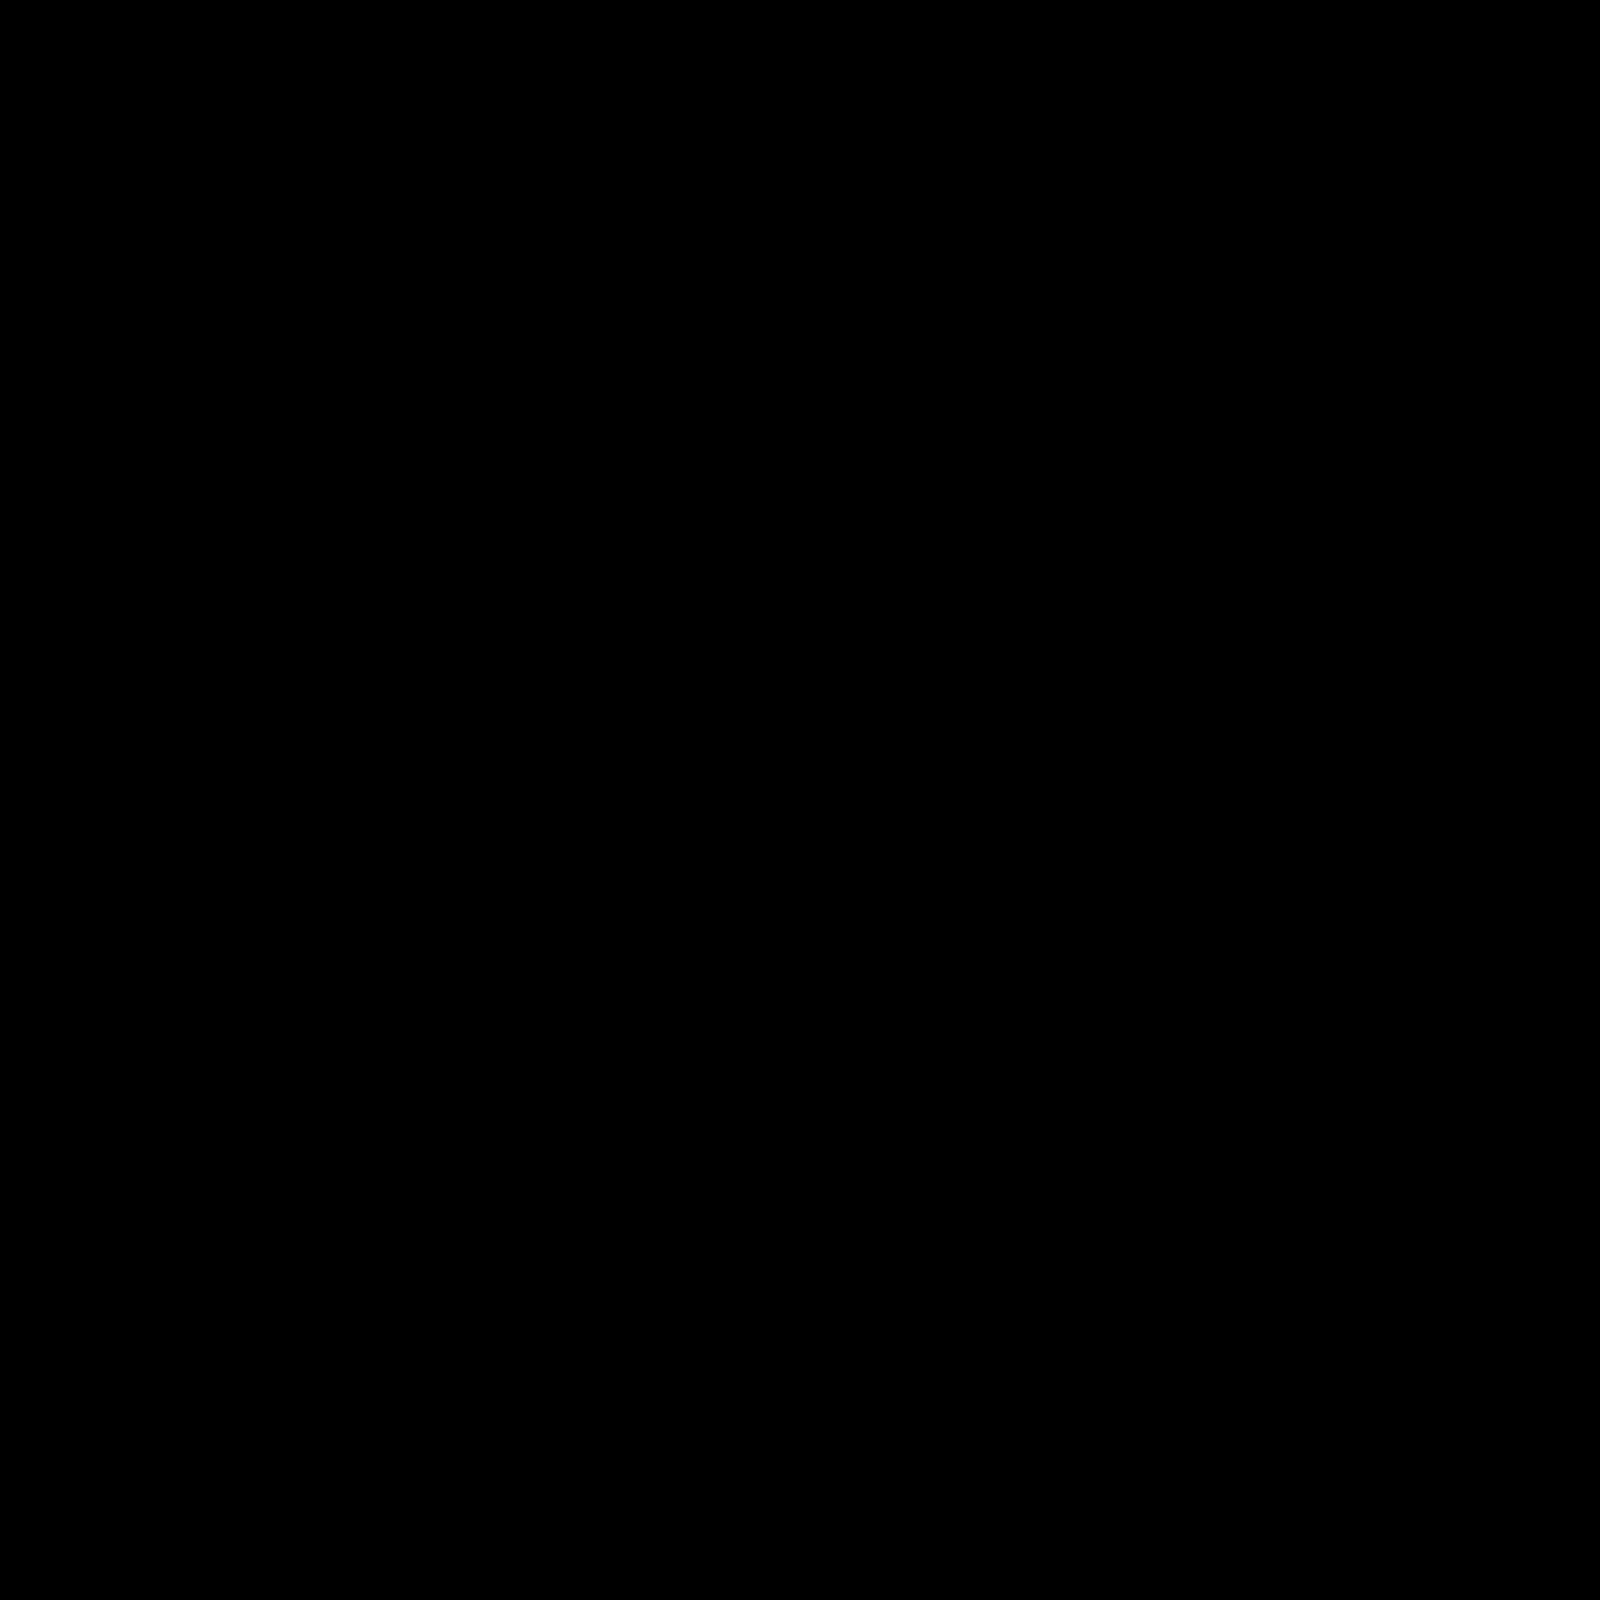 Слабый коннект icon